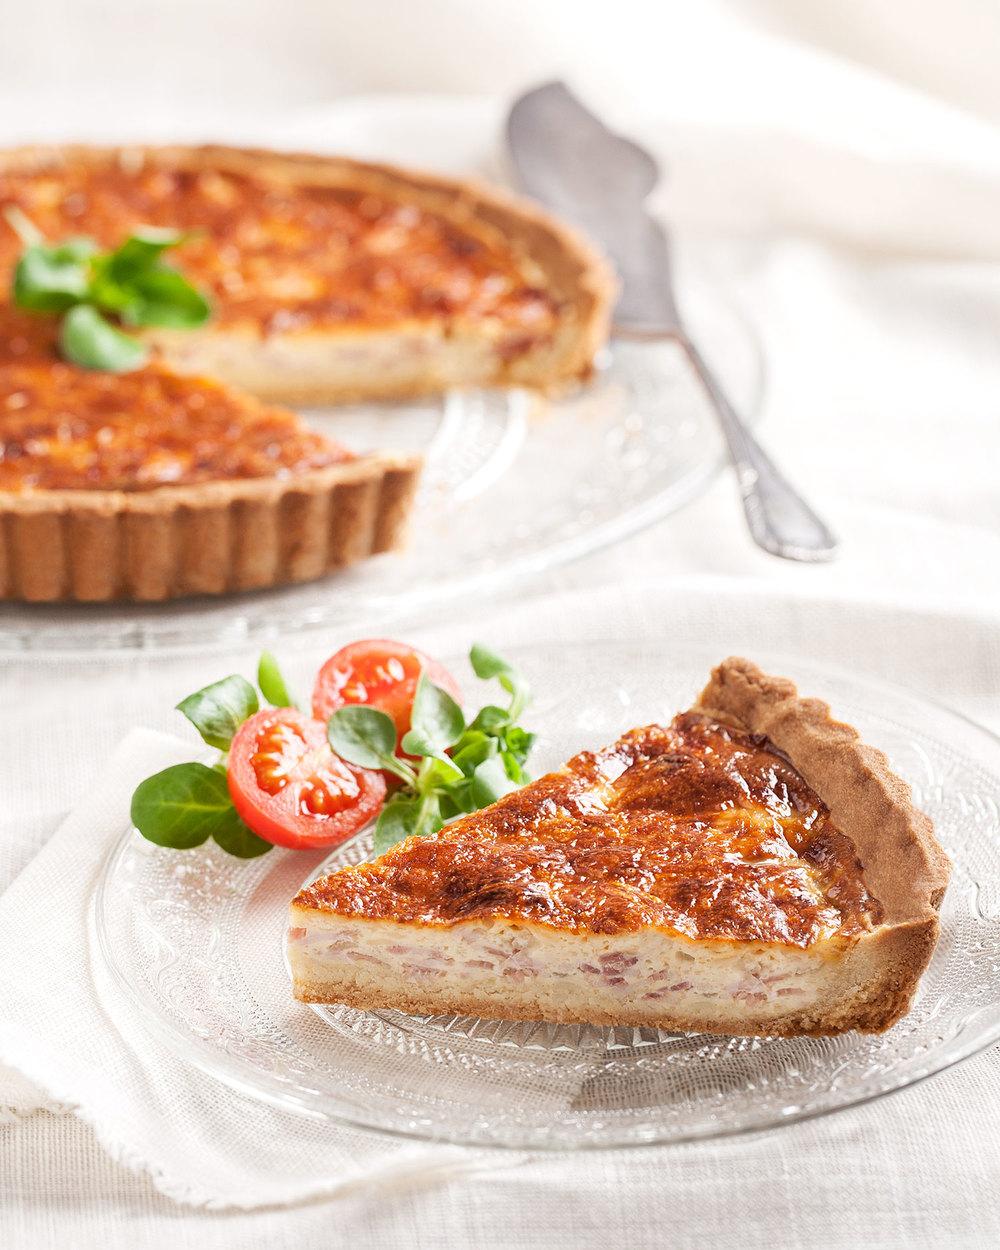 corina-landa-food-photography-fotografia-gastronomica-65.jpg